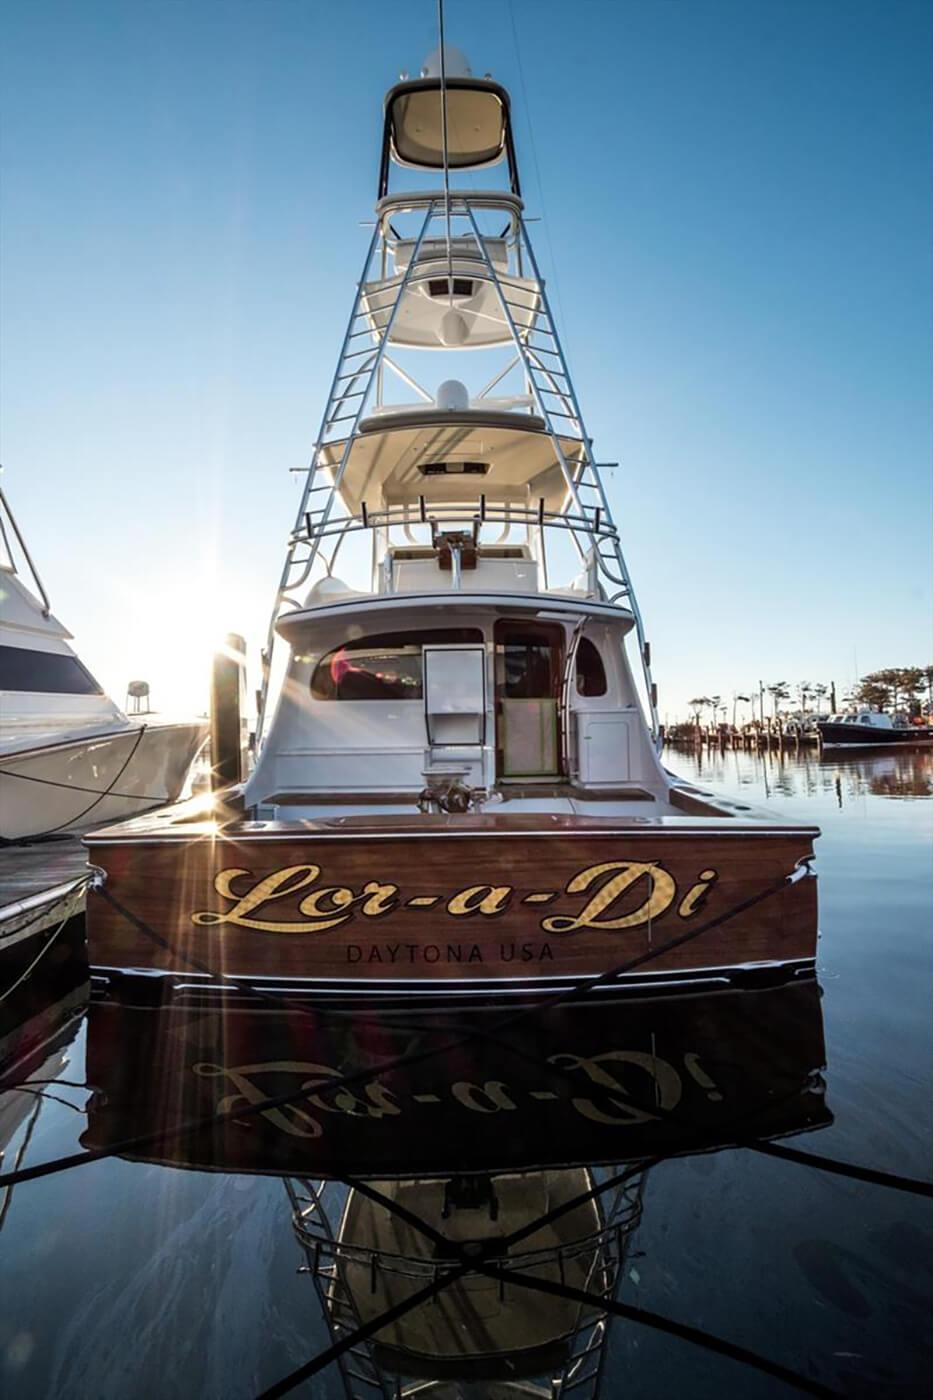 Lor A Di Daytona USA Faux Teak yachts transom bayliss docked